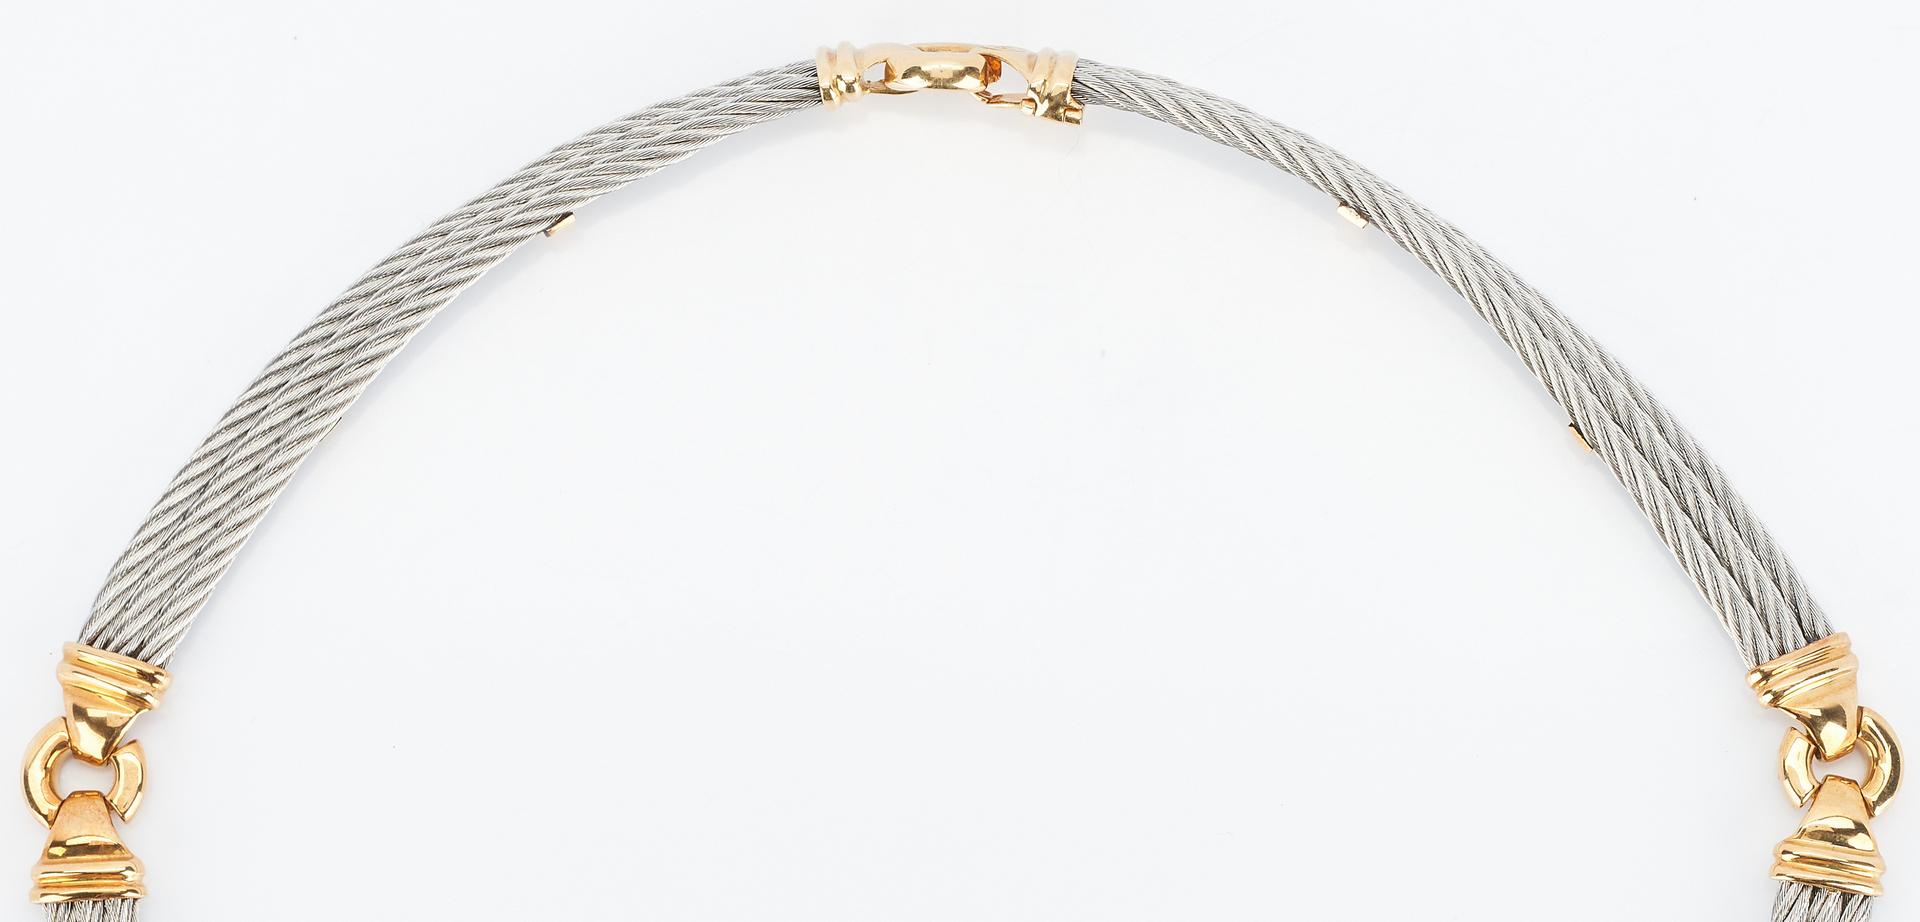 Lot 929: Phillipe Charriol 18K & Stainless Steel Necklace